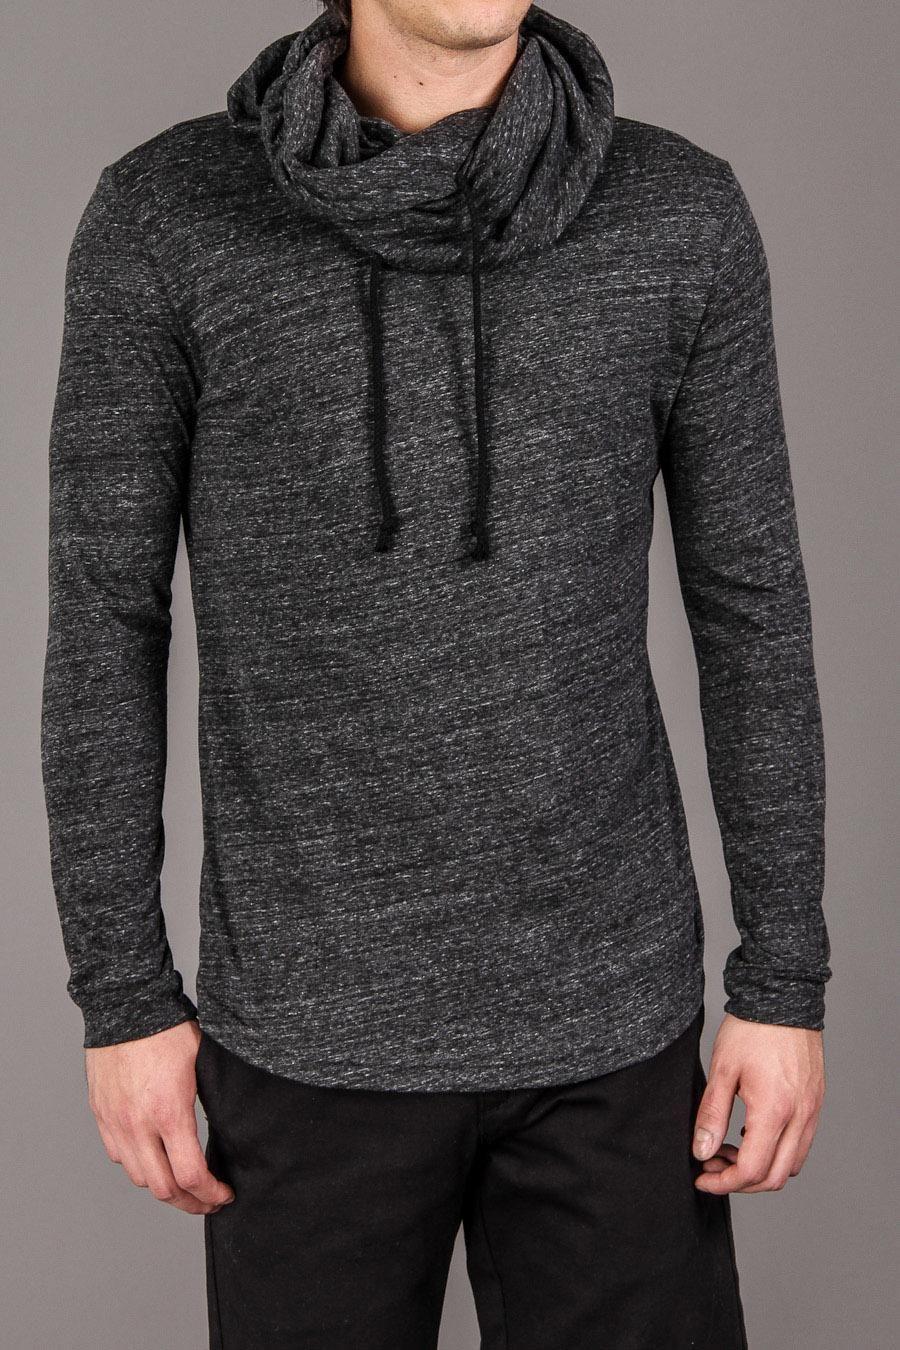 Lantern Cowl Collar Lightweight Sweater | Style and travel ...